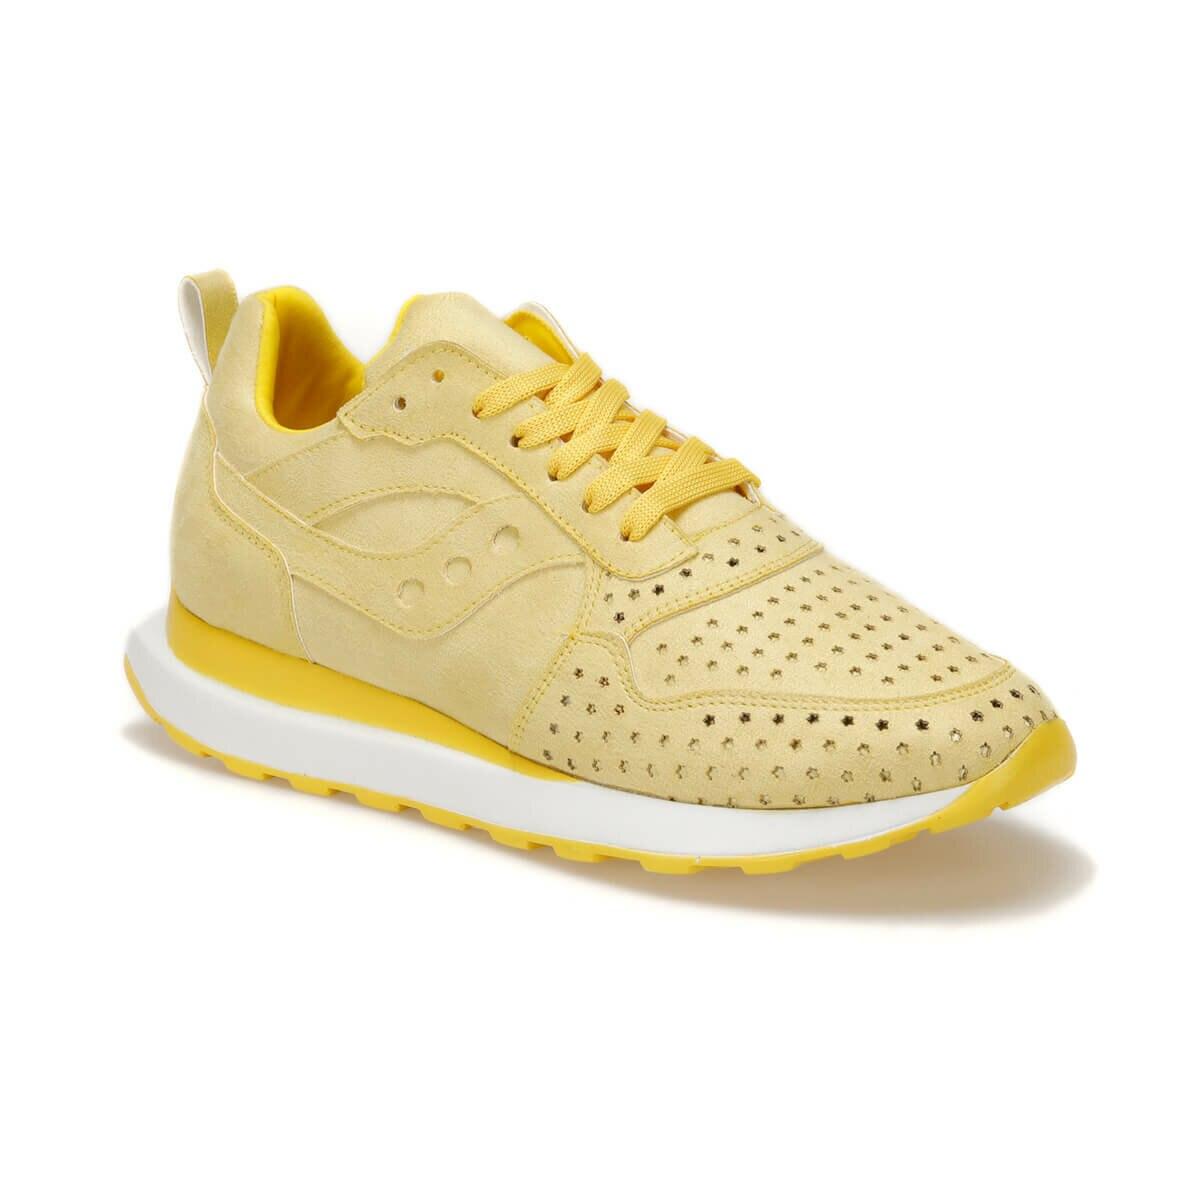 FLO CURRY51Z SUEDE Yellow Women 'S Sneaker Shoes BUTIGO